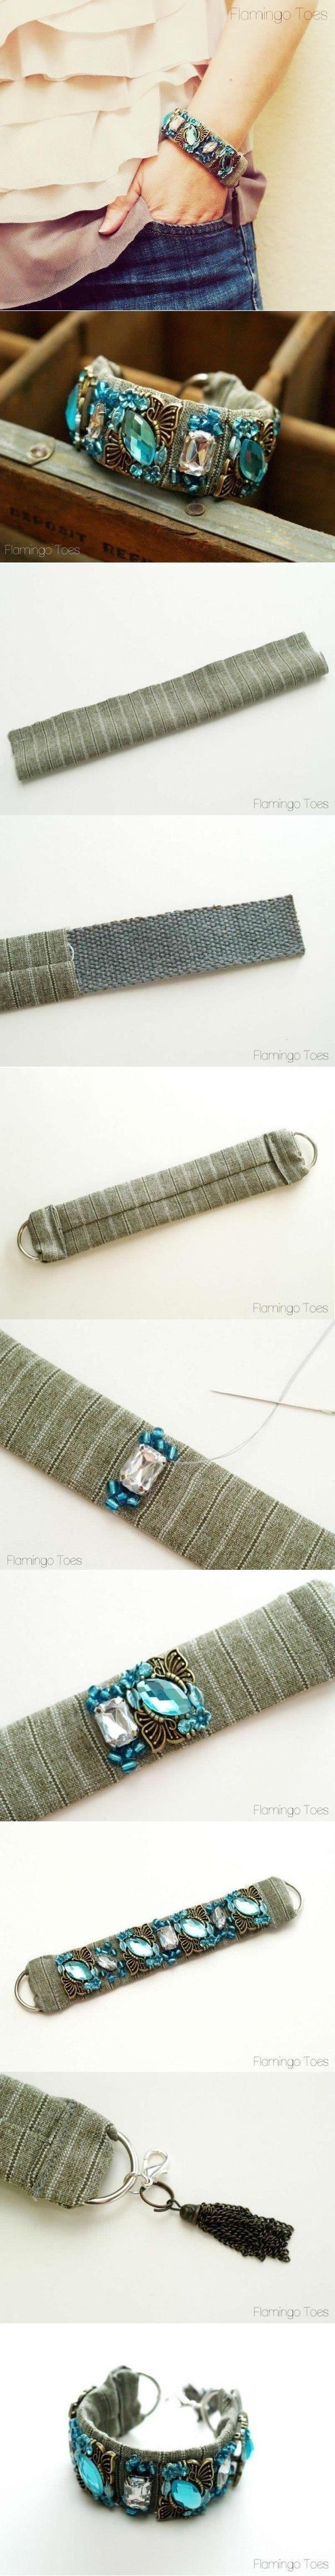 Anthro Knockoff Fori Bracelet - tutorial make a fitbit pocket